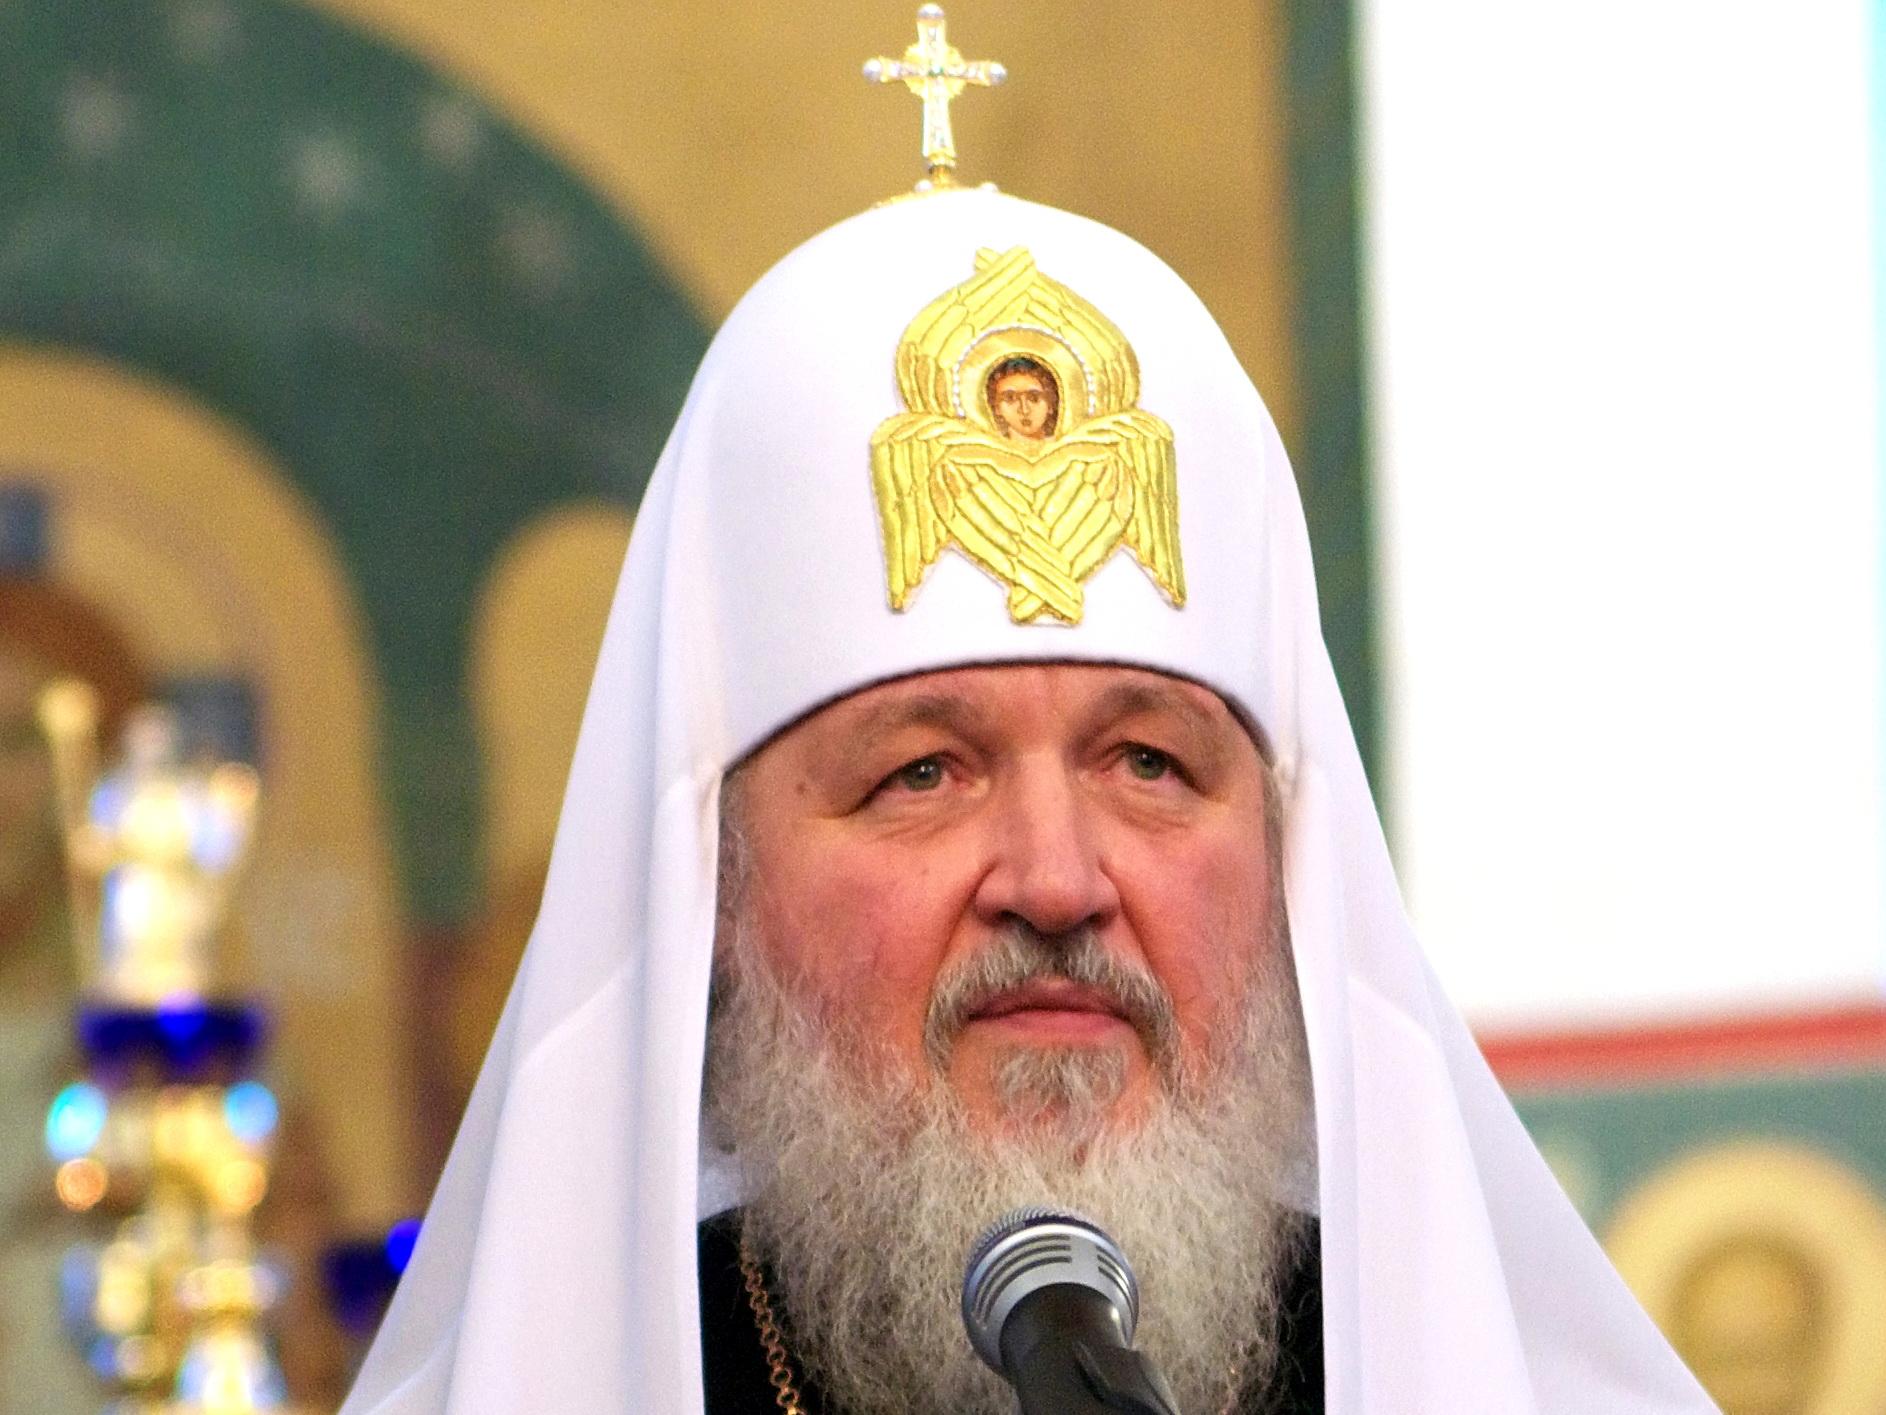 Патриарх Кирилл освятит церковь в Баку - ФОТО